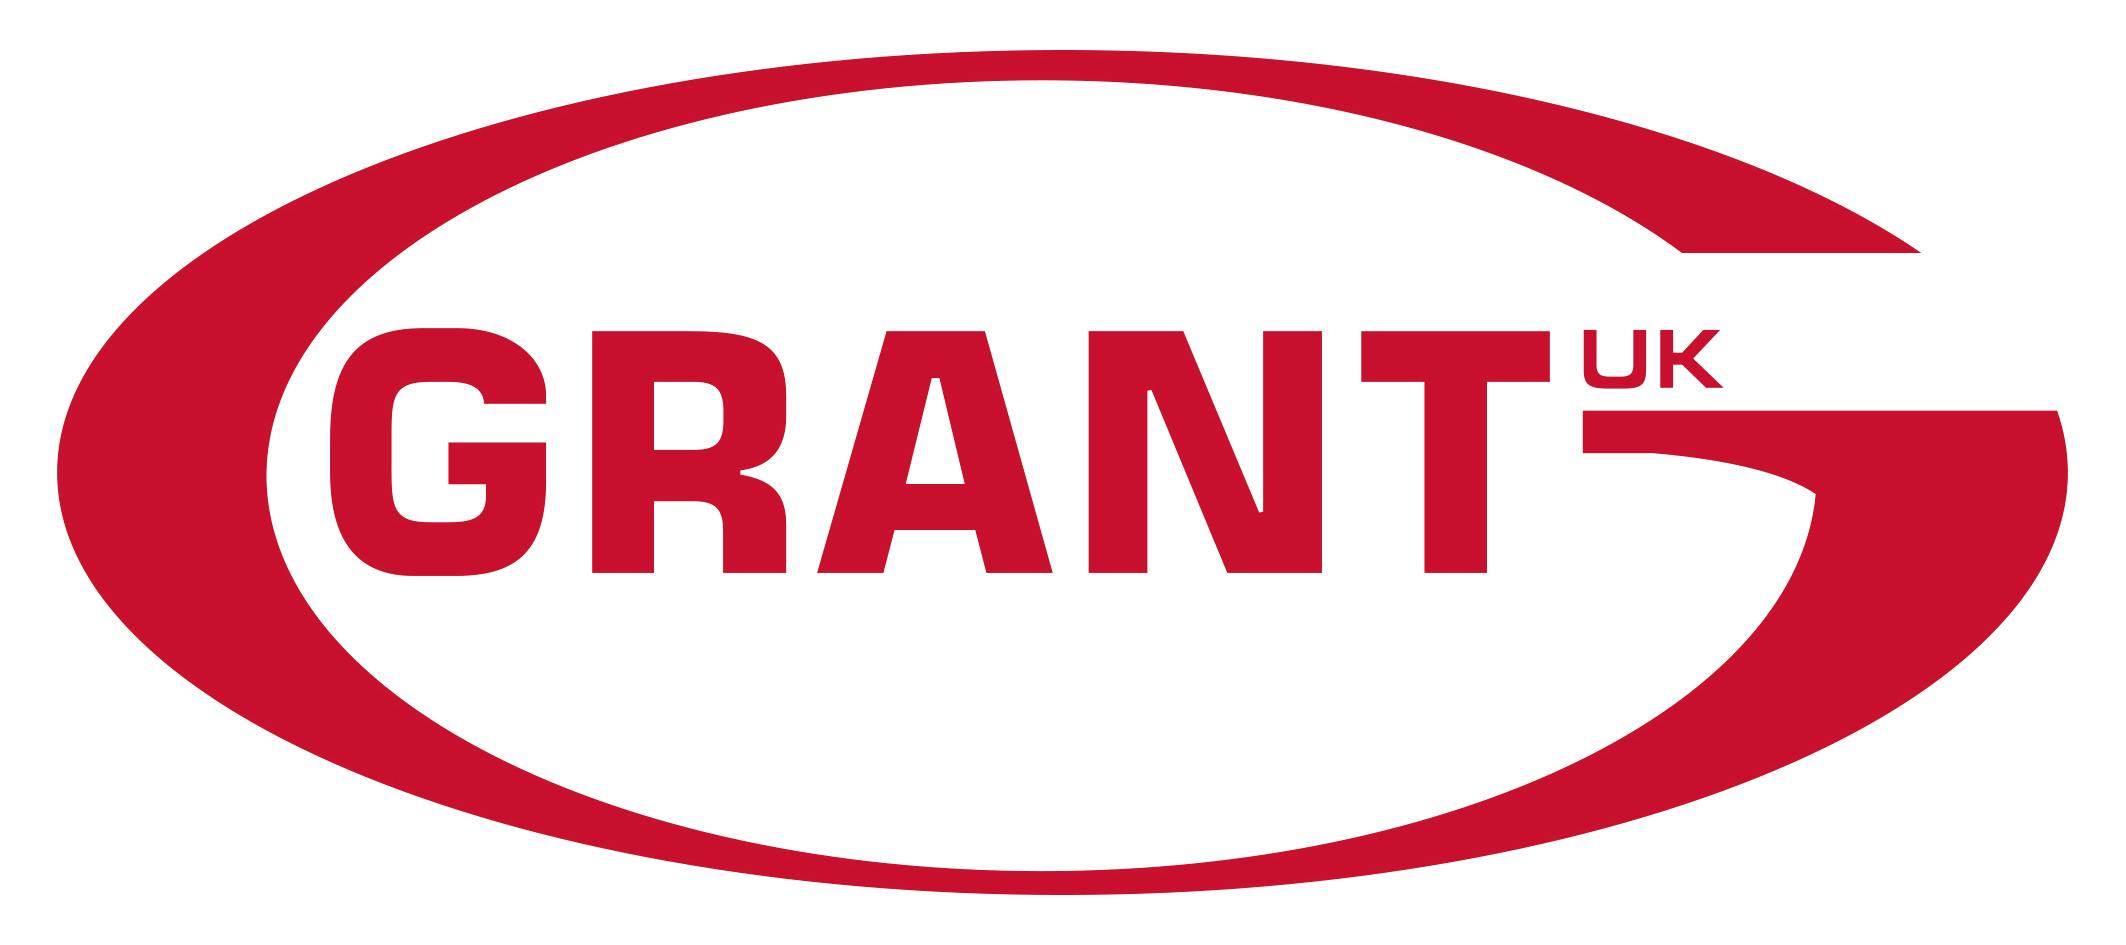 Grant UK